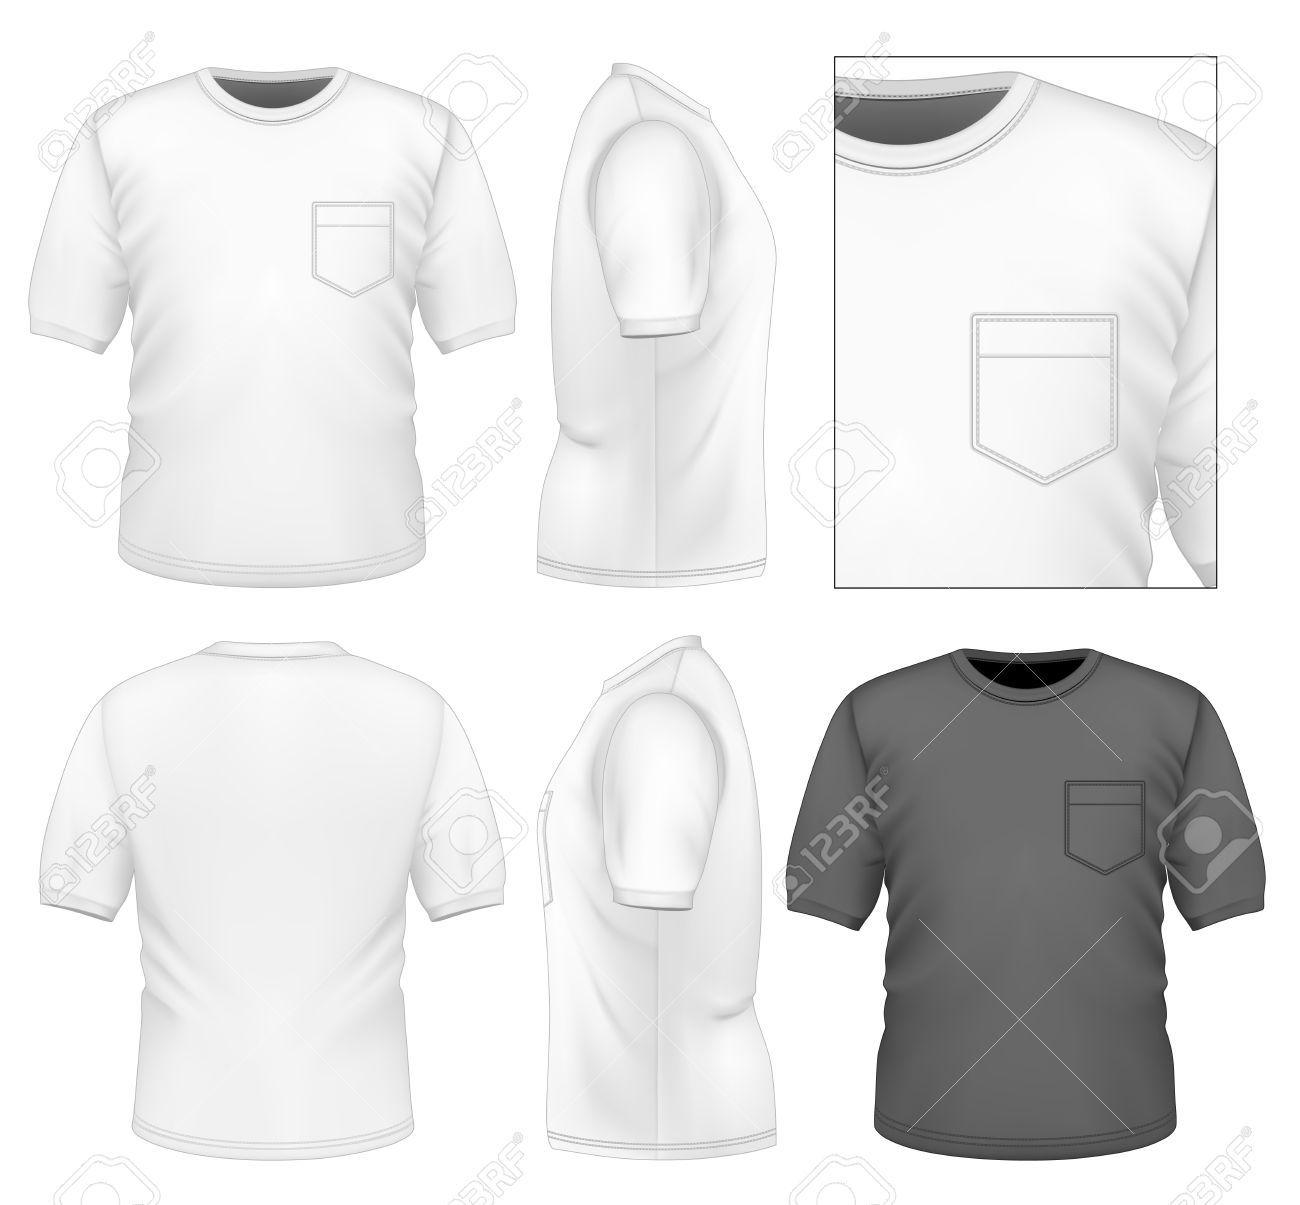 Pin de M-Design . en Fashion Technical Drawing | Pinterest